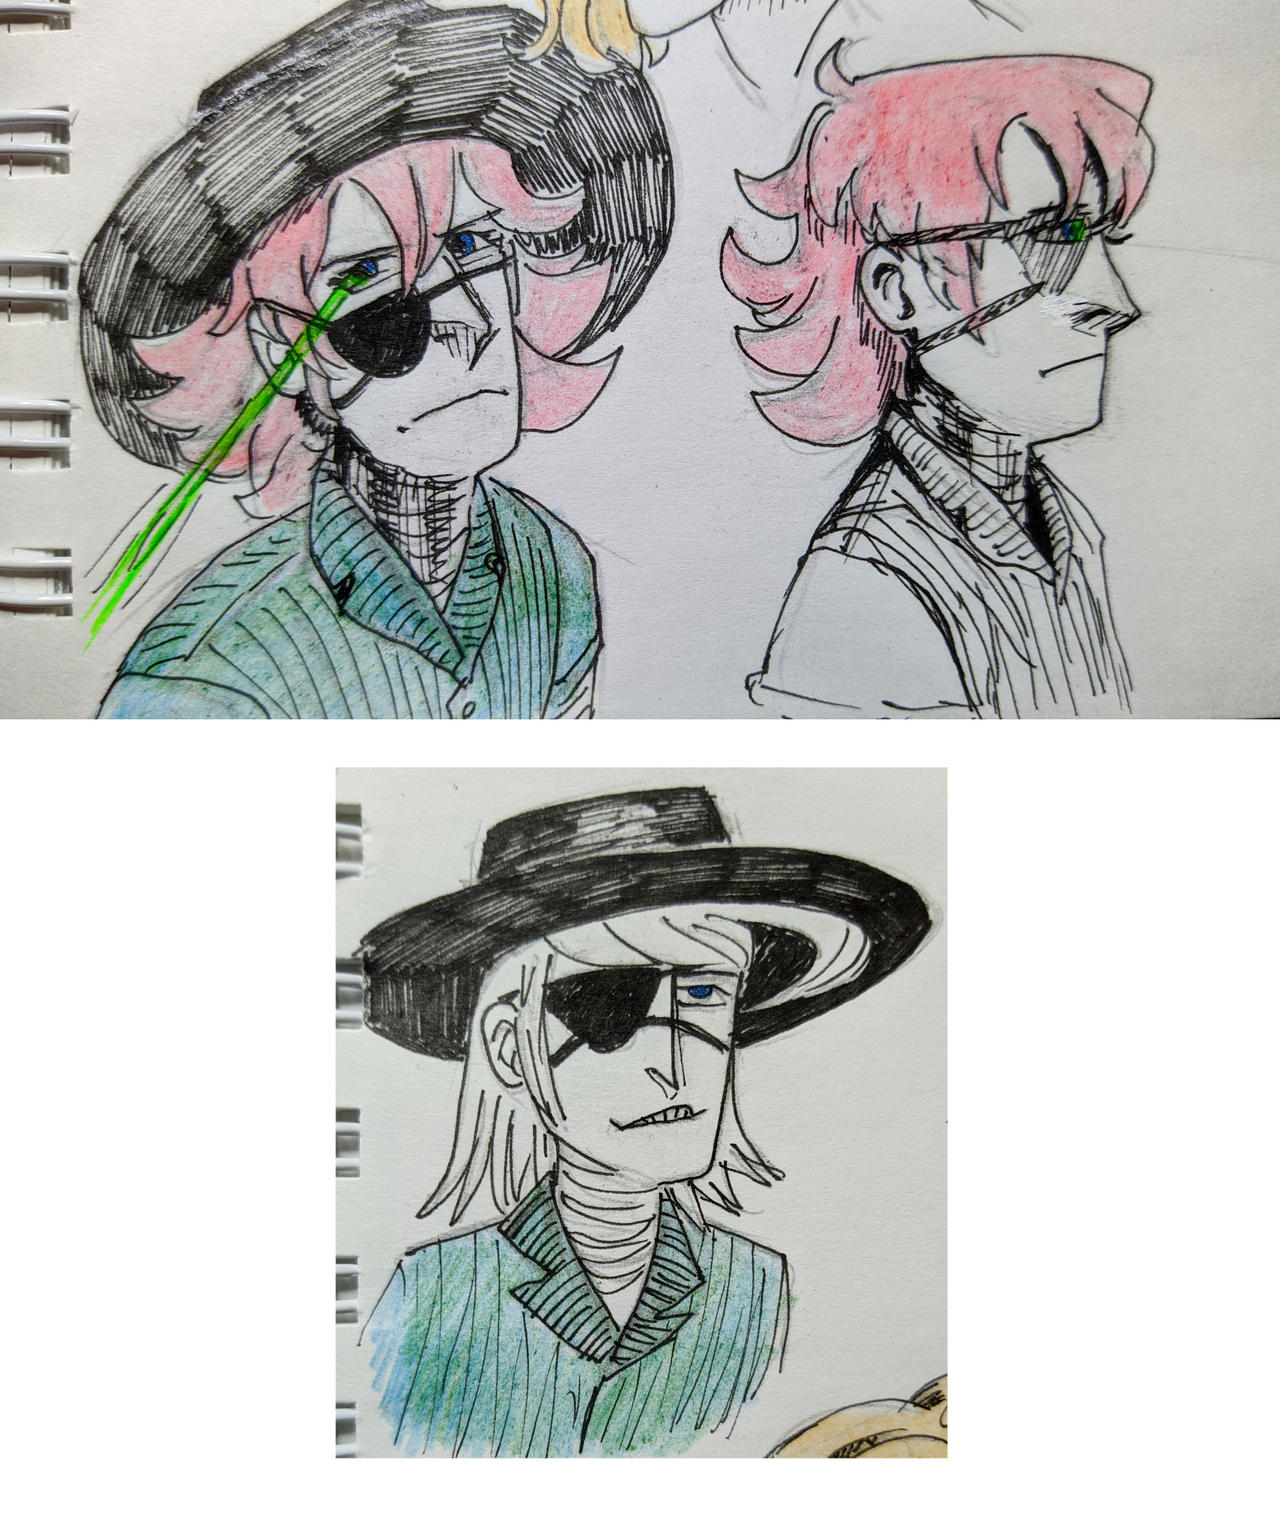 Miller pencil sketches (2020 art)